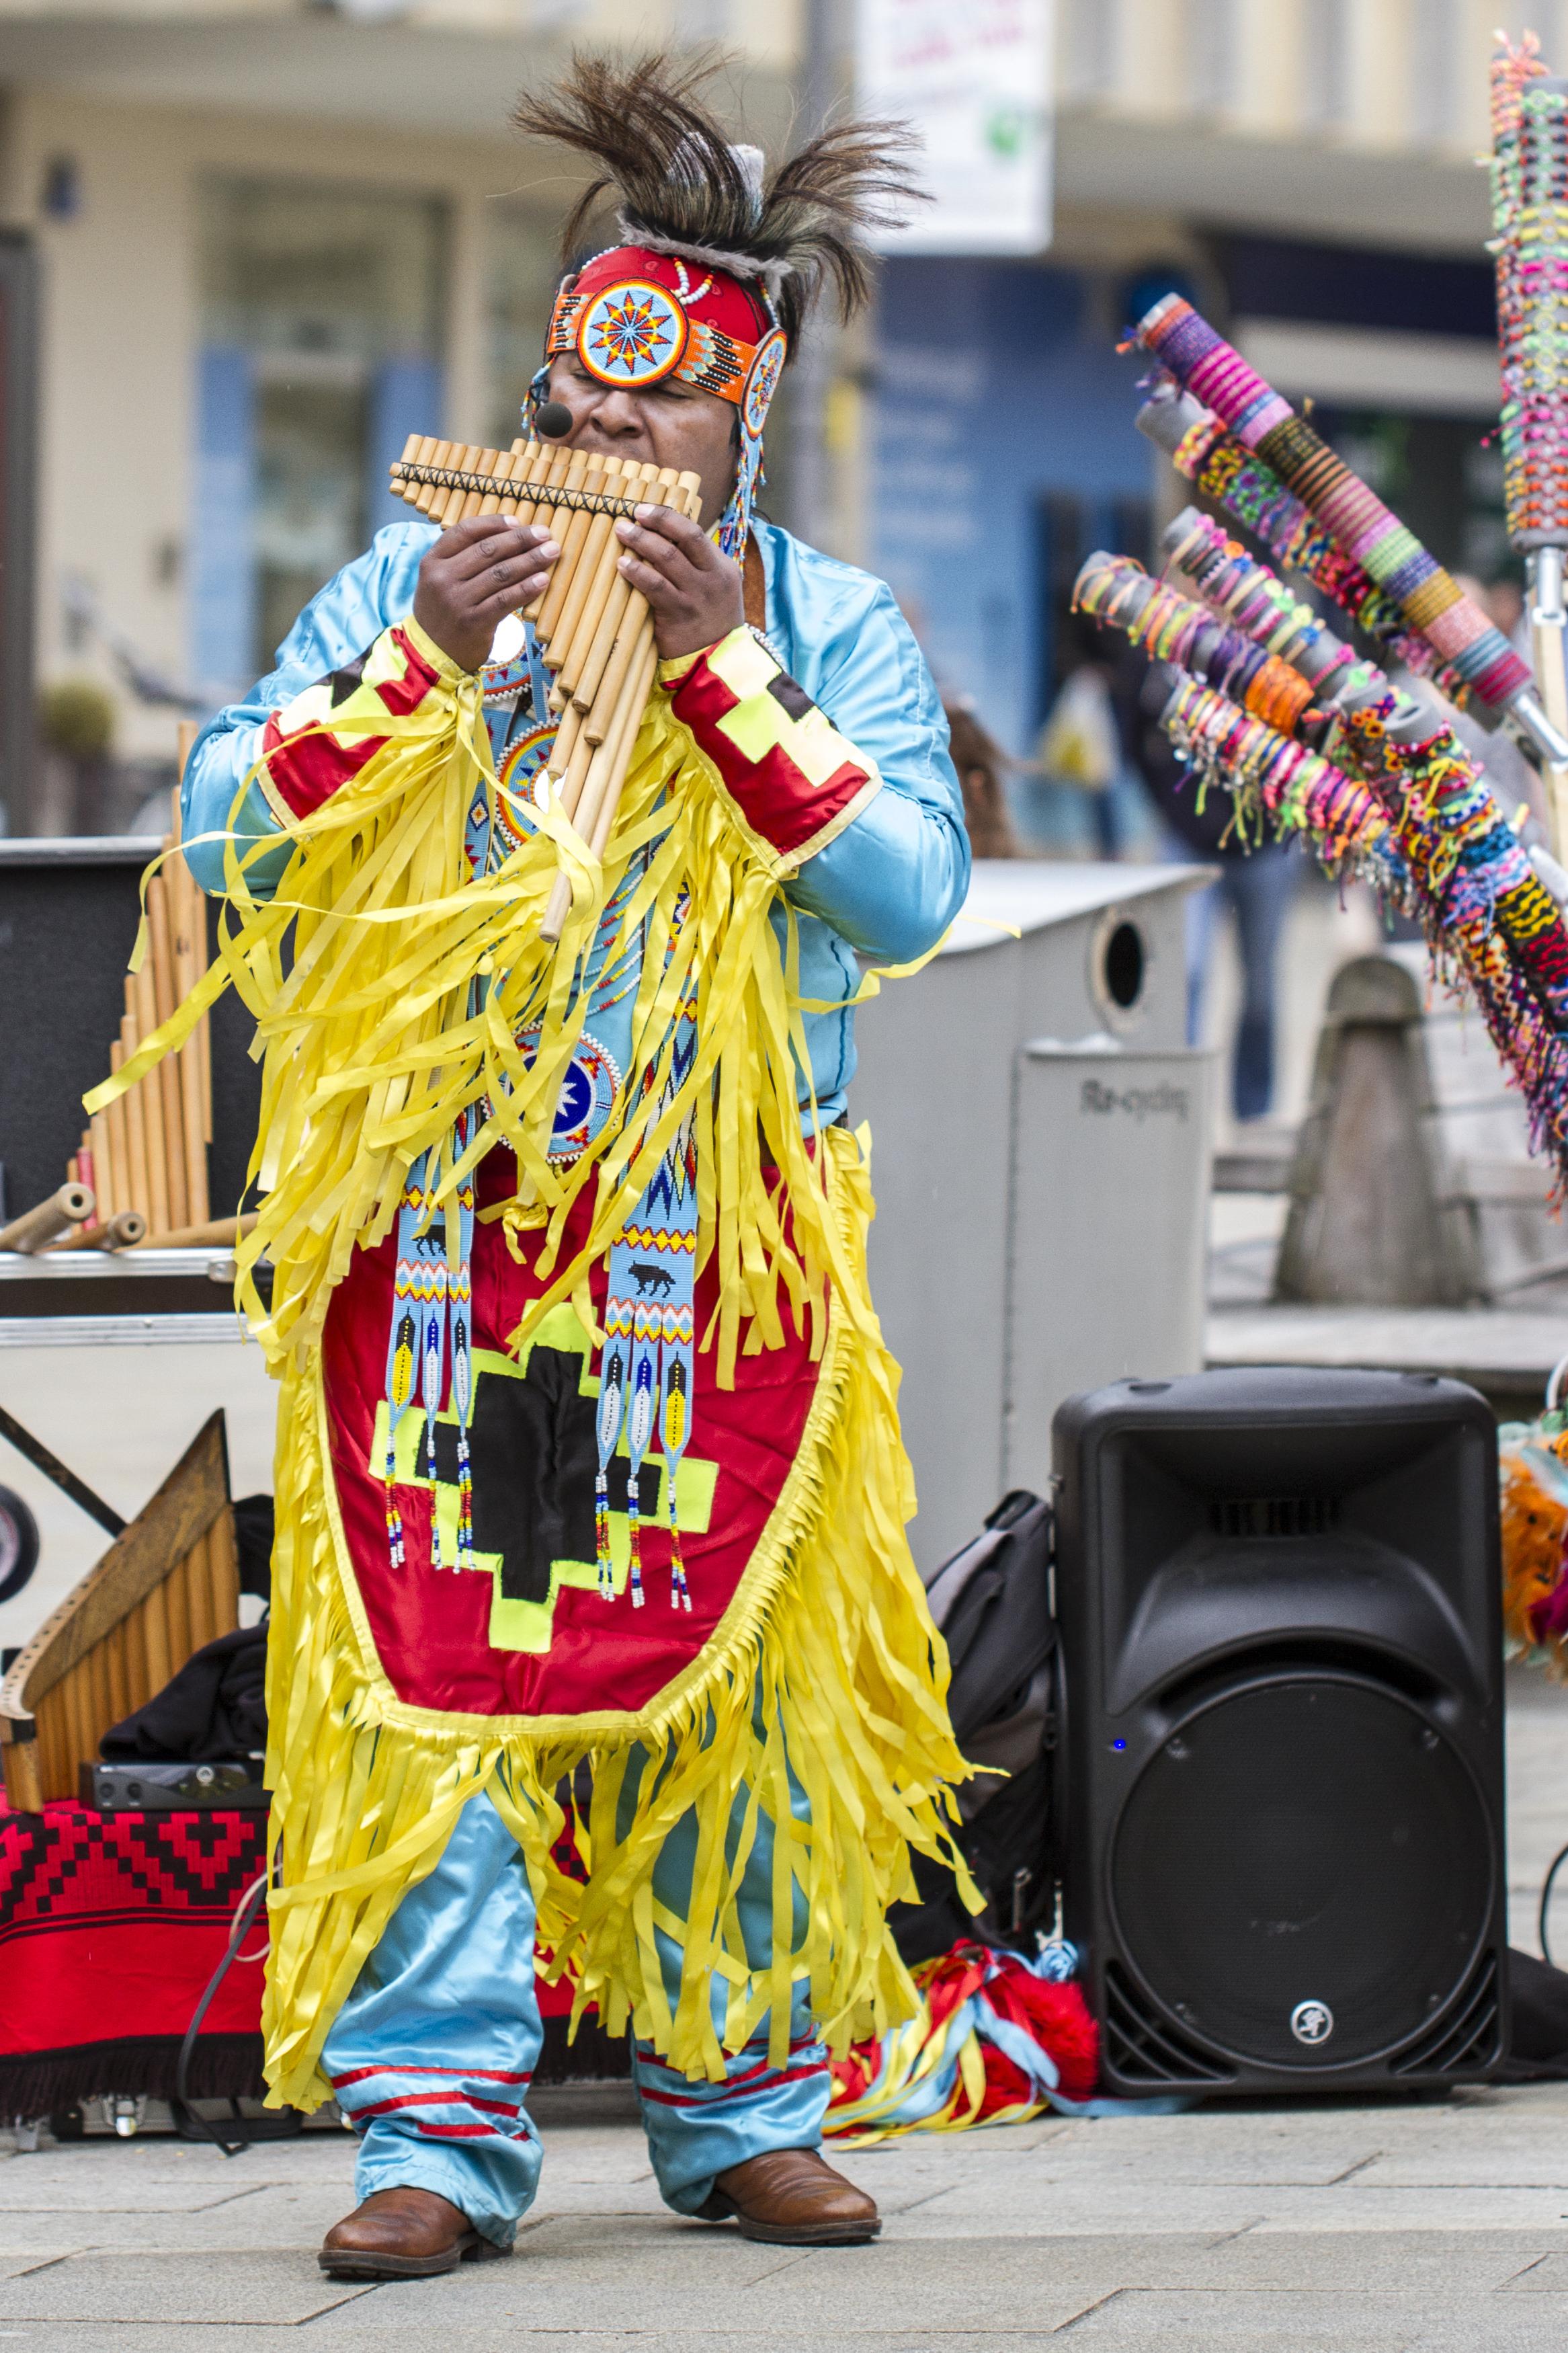 free images dance portrait carnival colourful color clothing